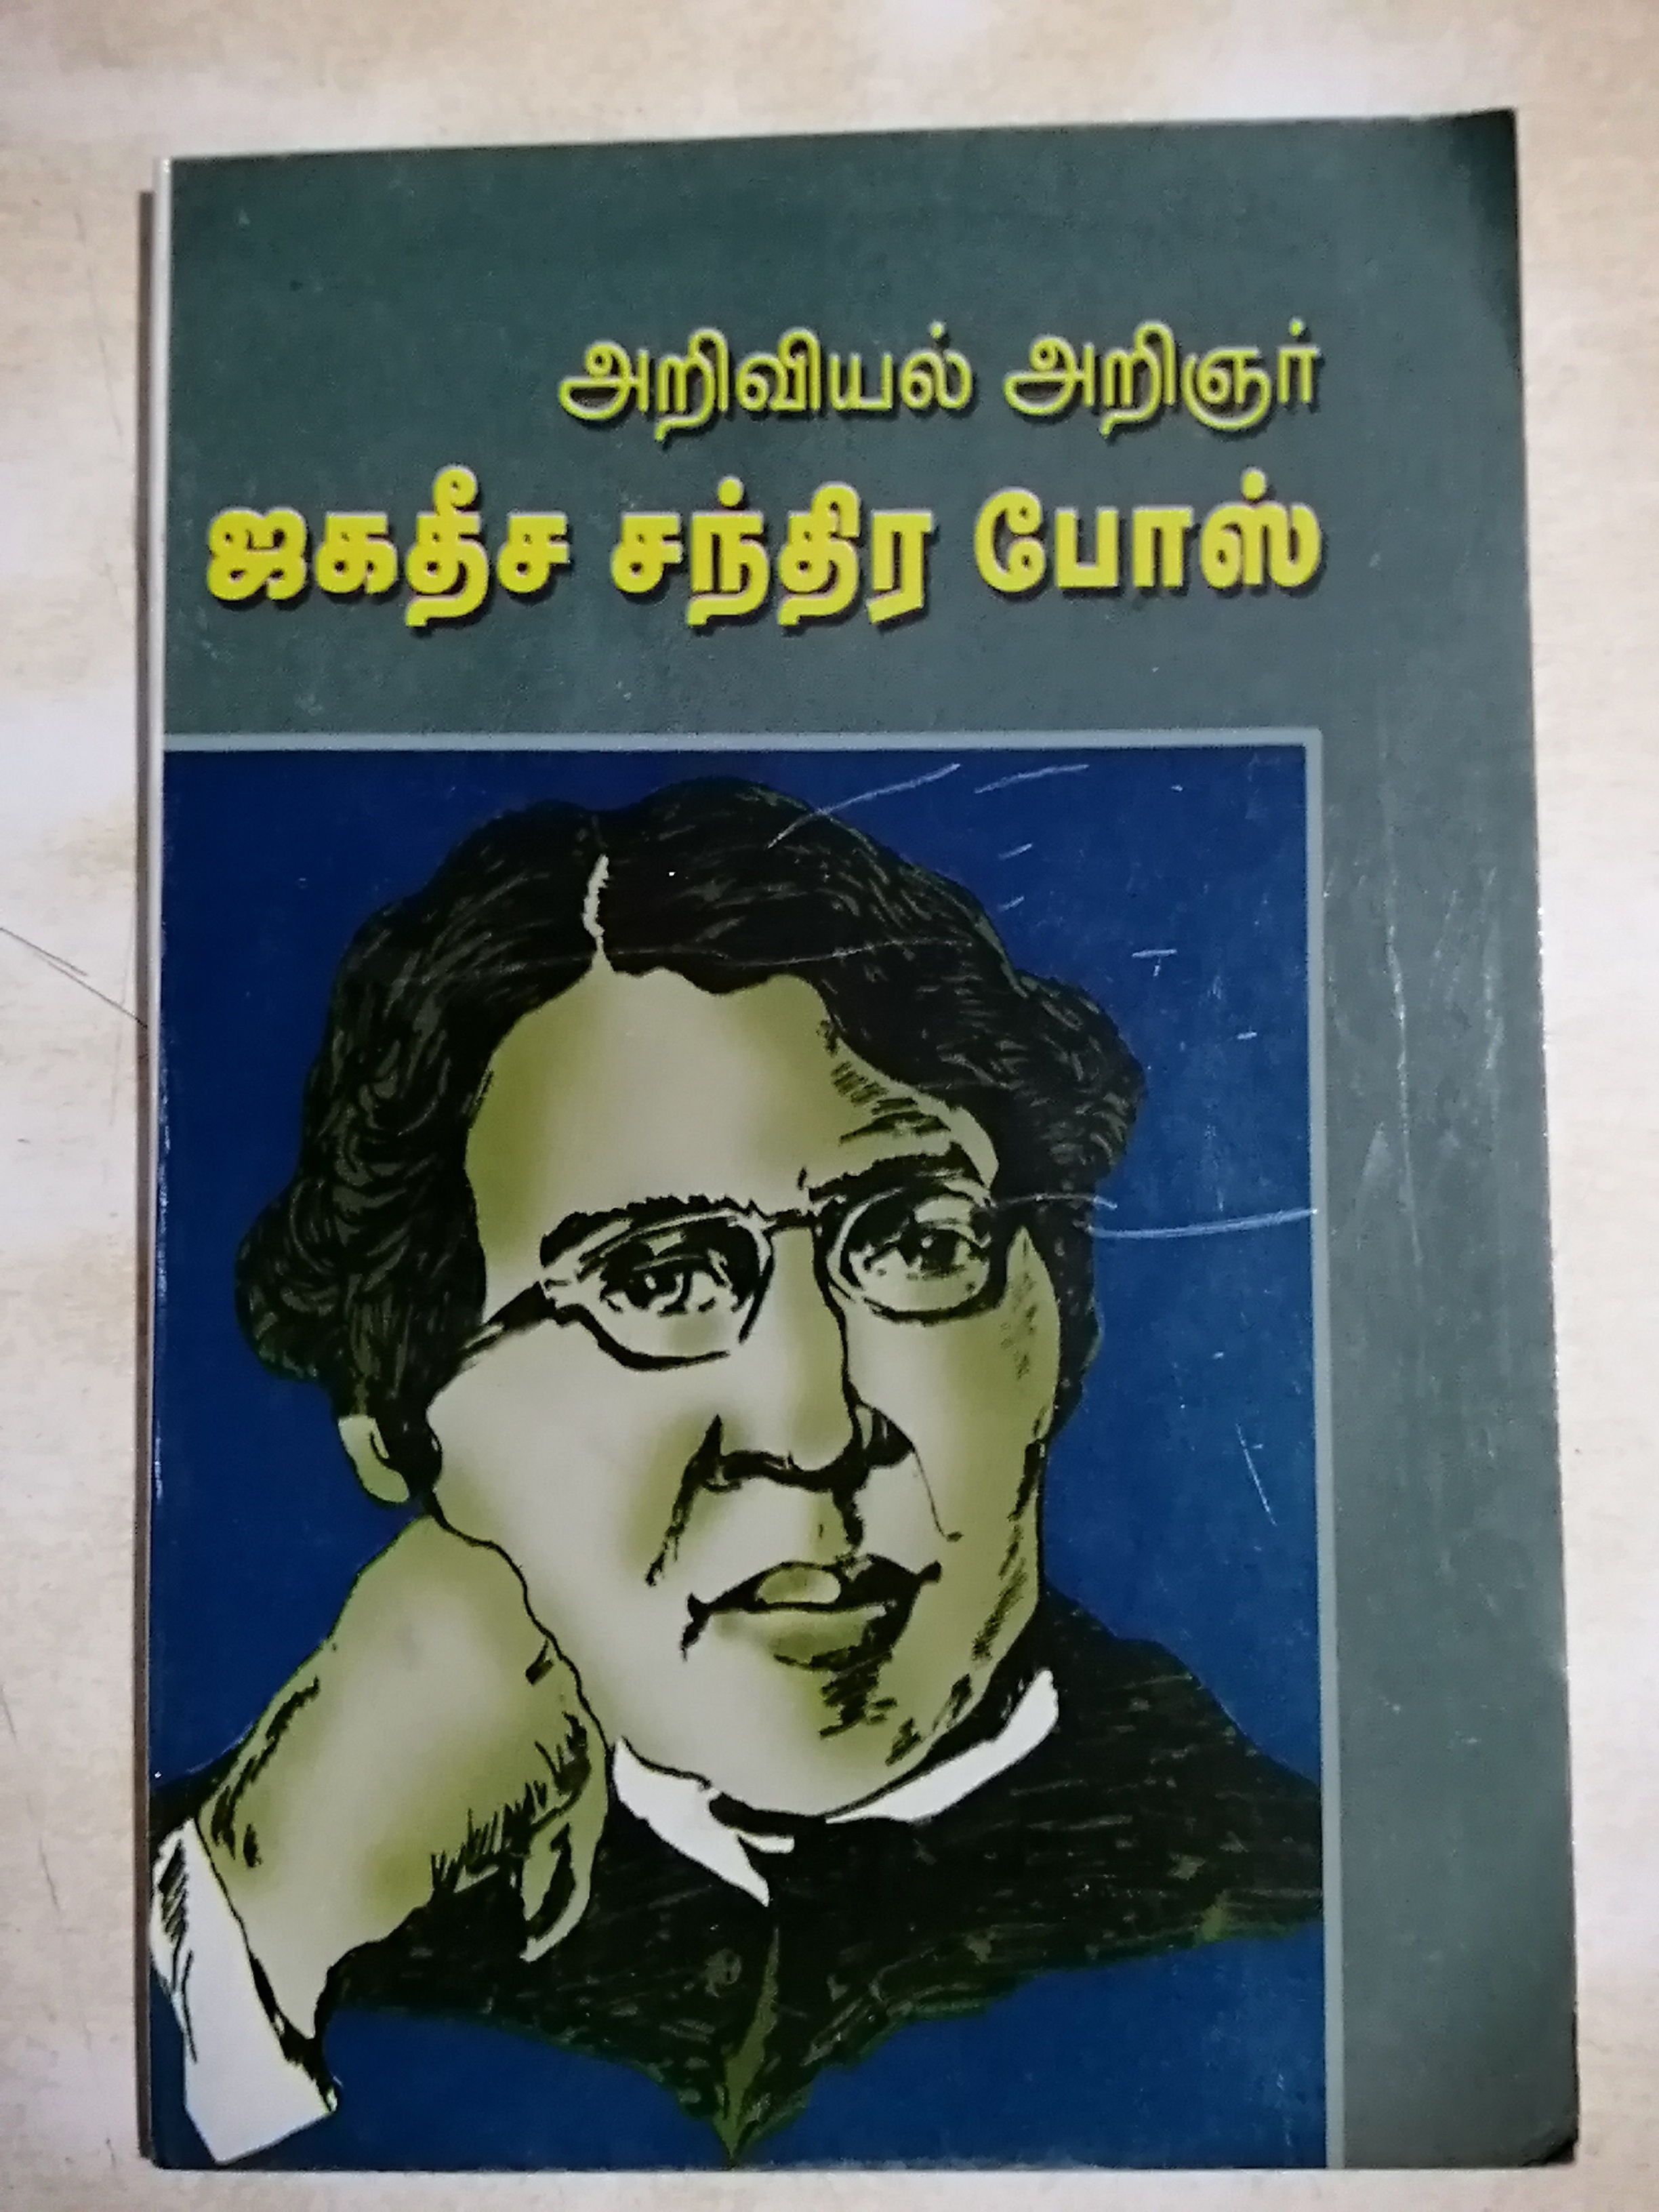 Ariviyal Arignar Jagadish Chandra Bose by N V Kalaimani அறிவியல் அறிஞர் ஜகதீச சந்திர போஸ் - என். வி. கலைமணி